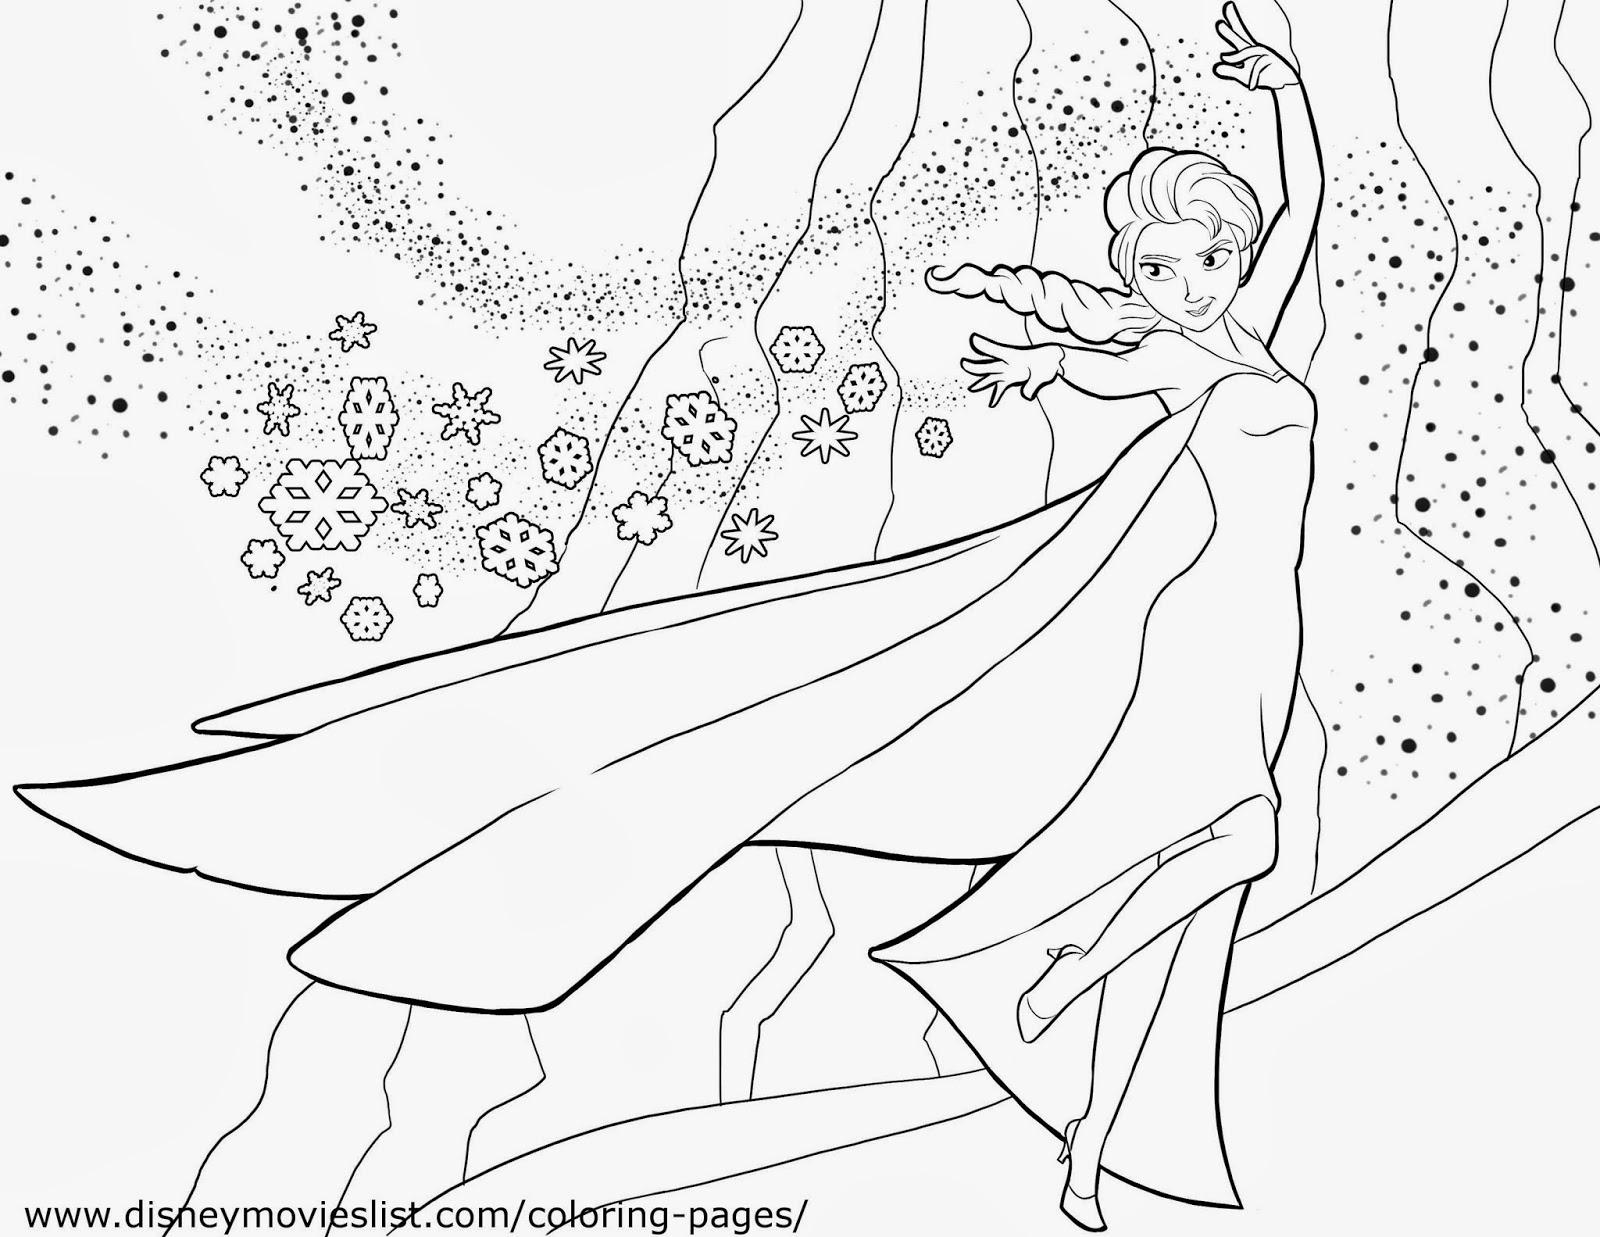 Desenho De Colorir Frozen: BAÚ DA WEB : Desenhos De Frozen